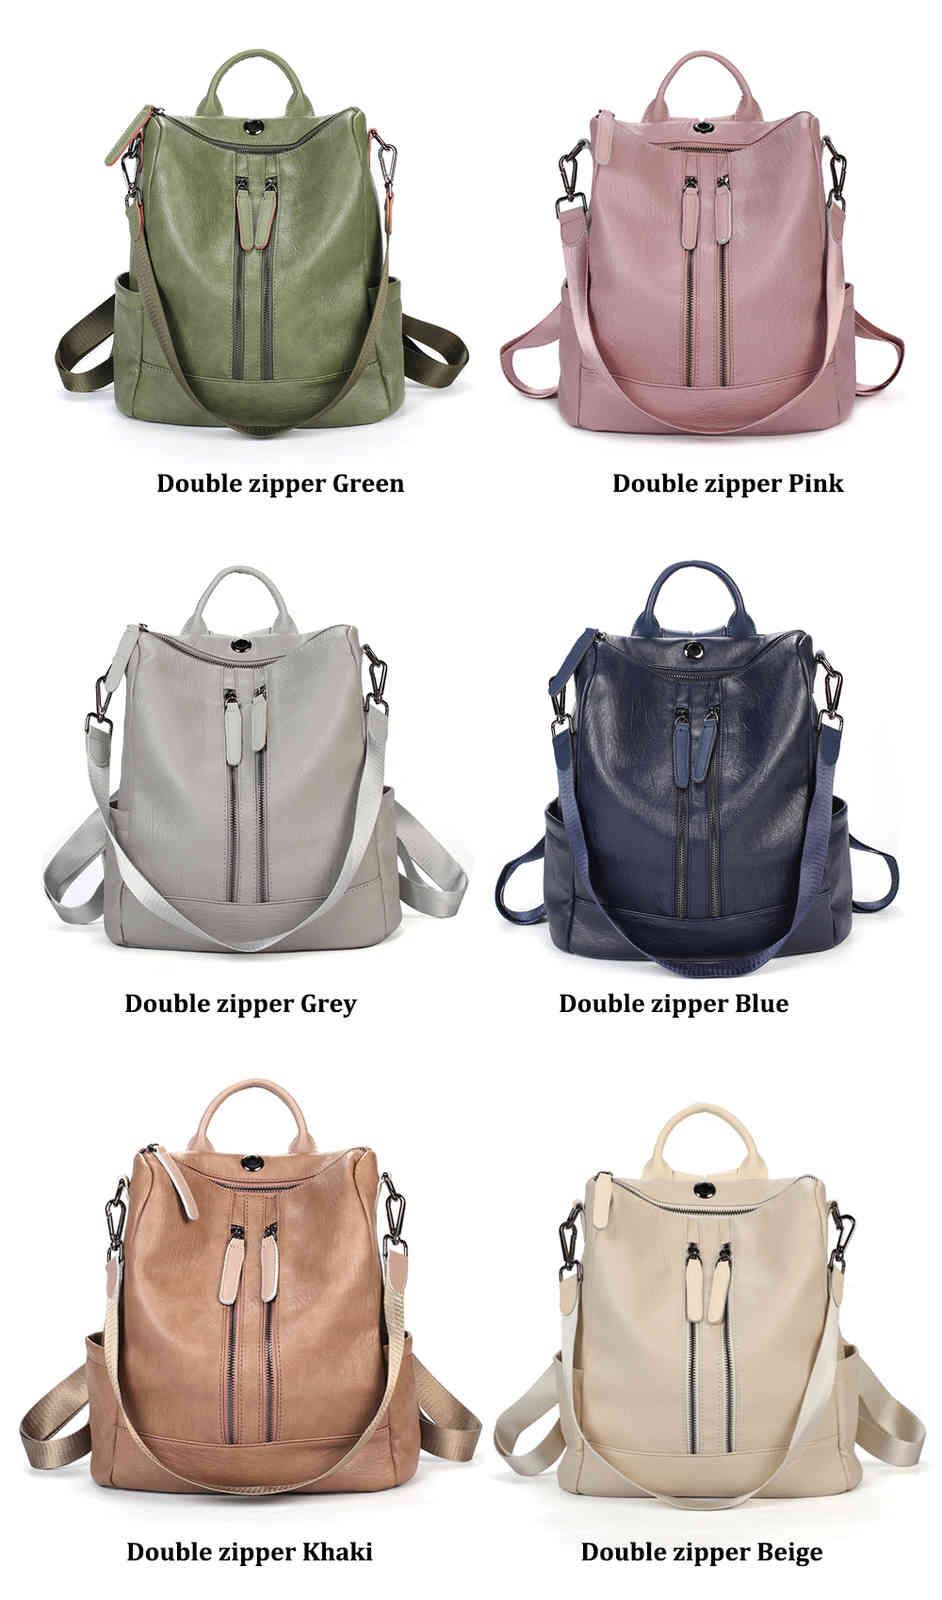 double zipper backpack